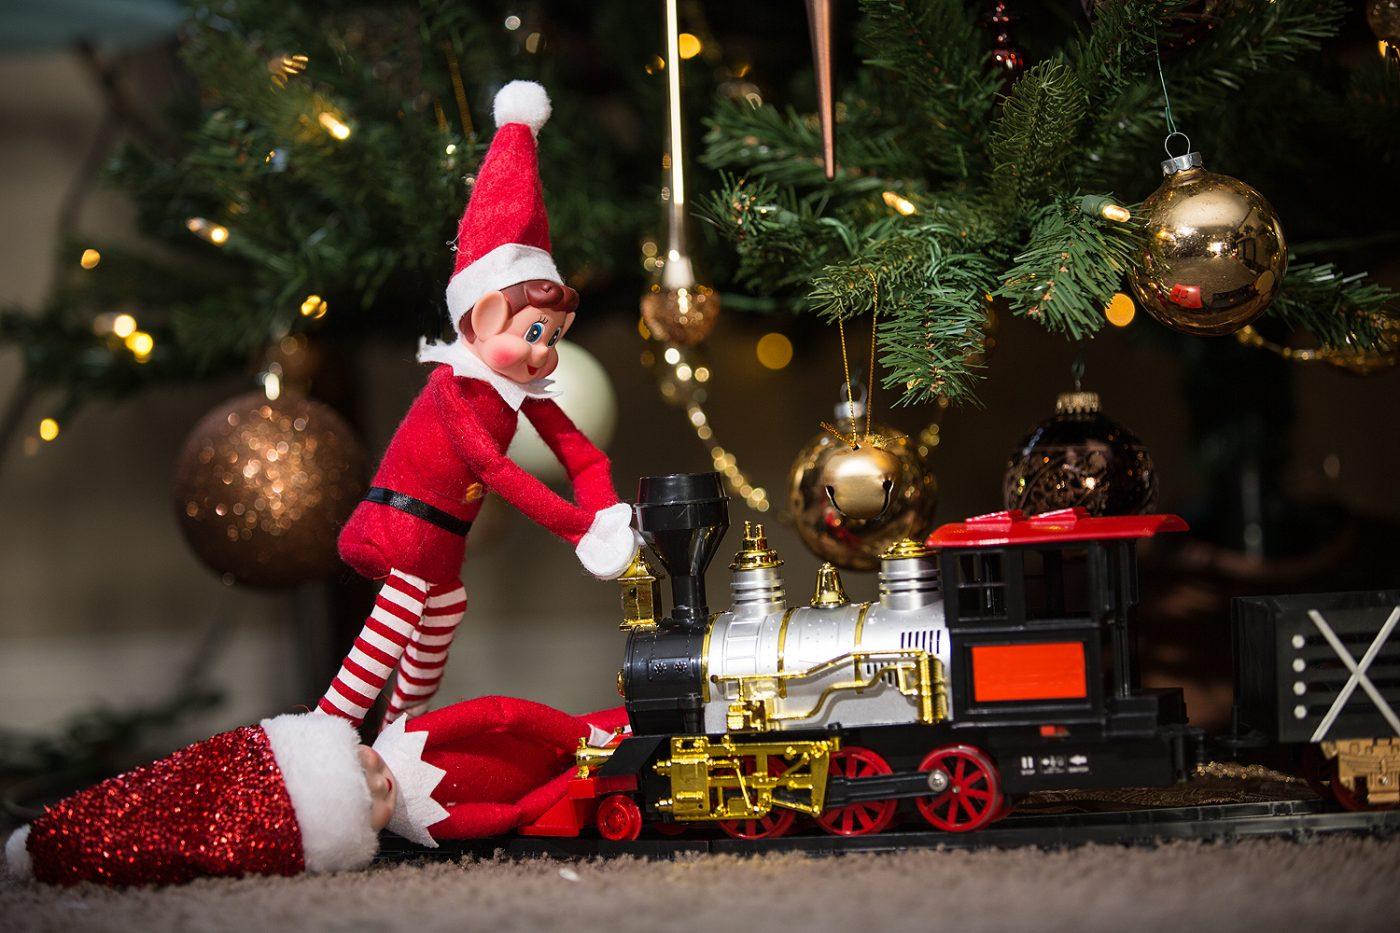 Elf on the shelf pushing train